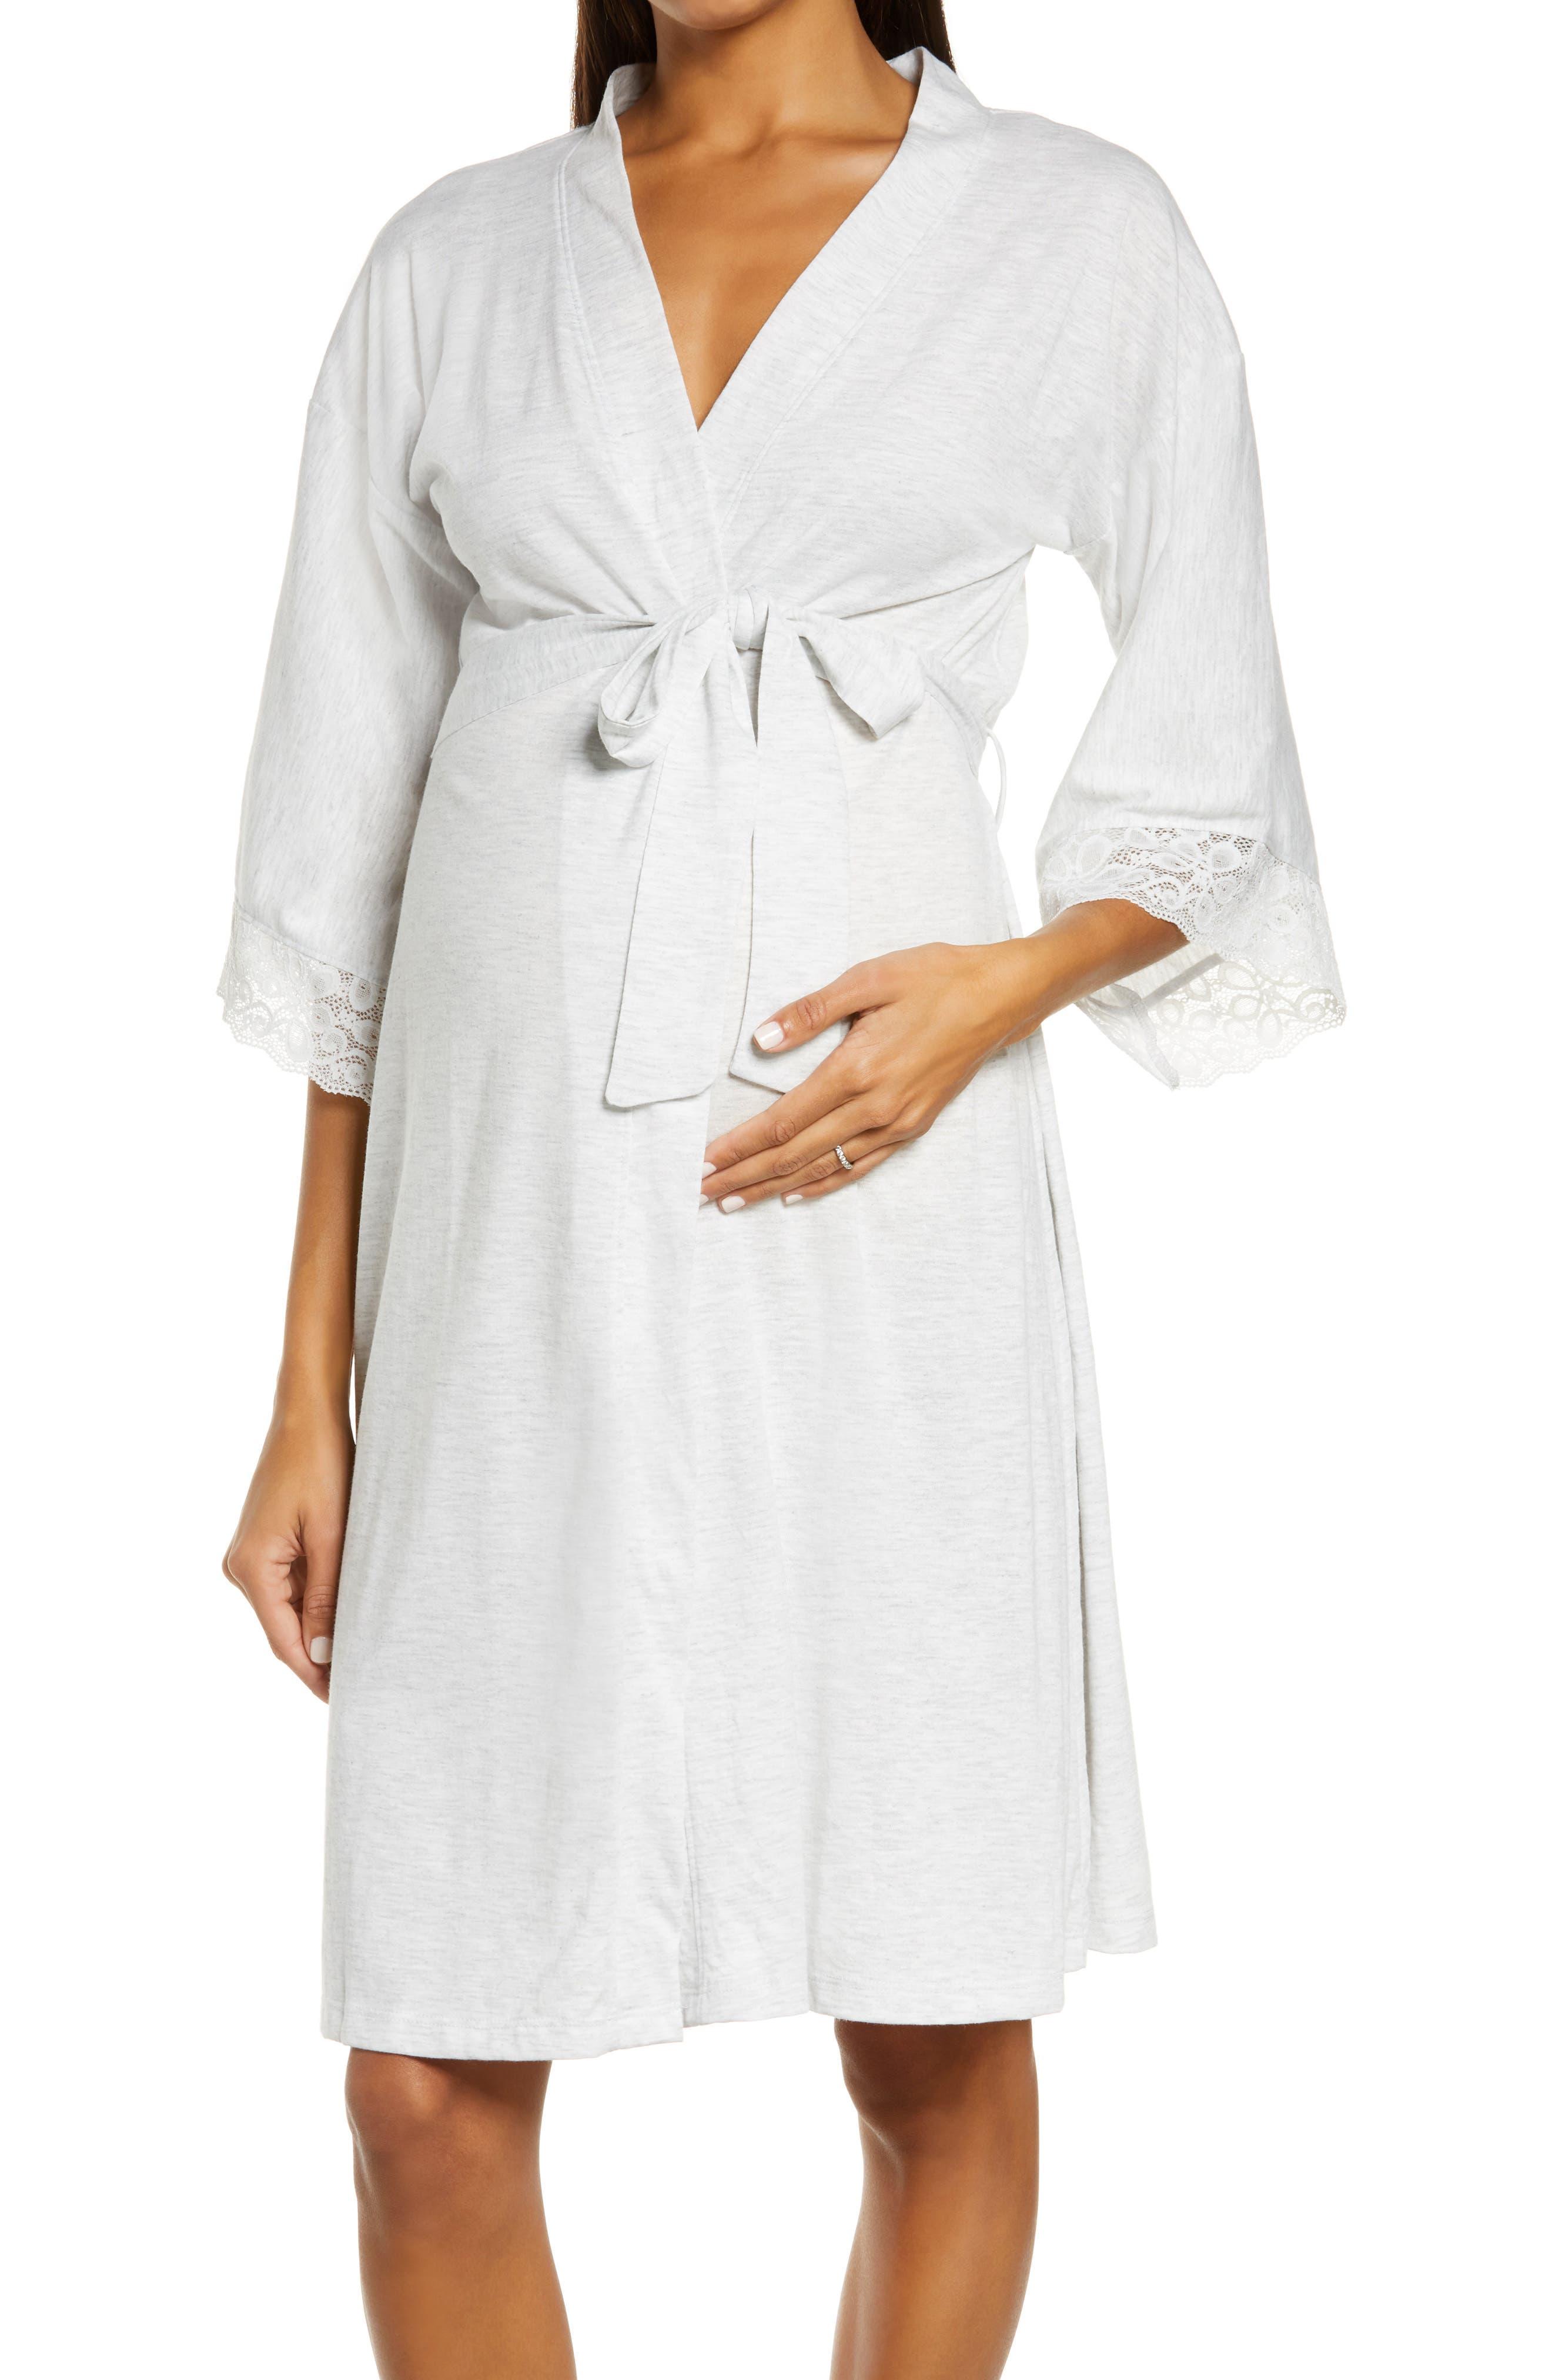 Tallulah Maternity/nursing Robe